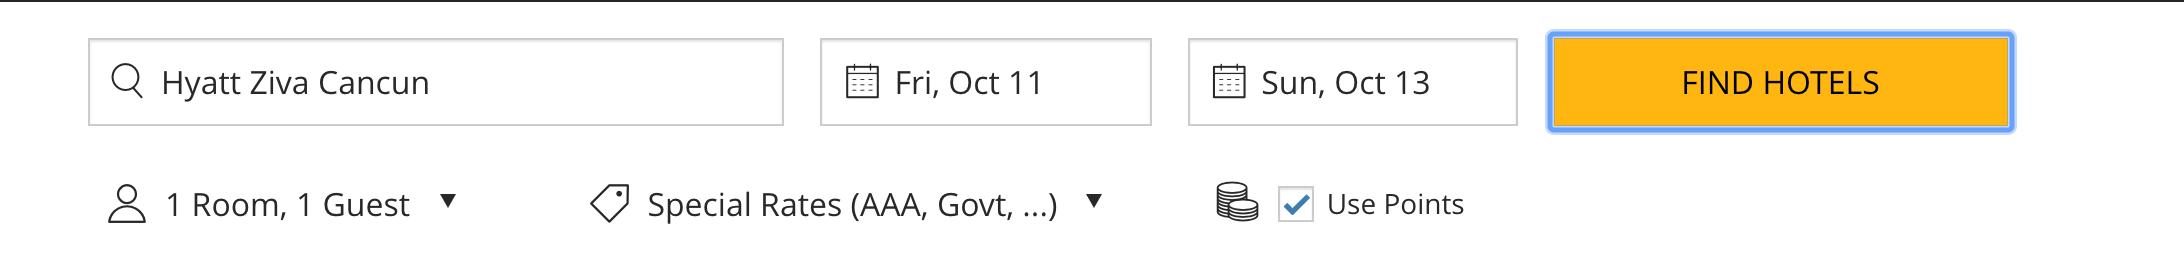 Screenshot from Hyatt.com